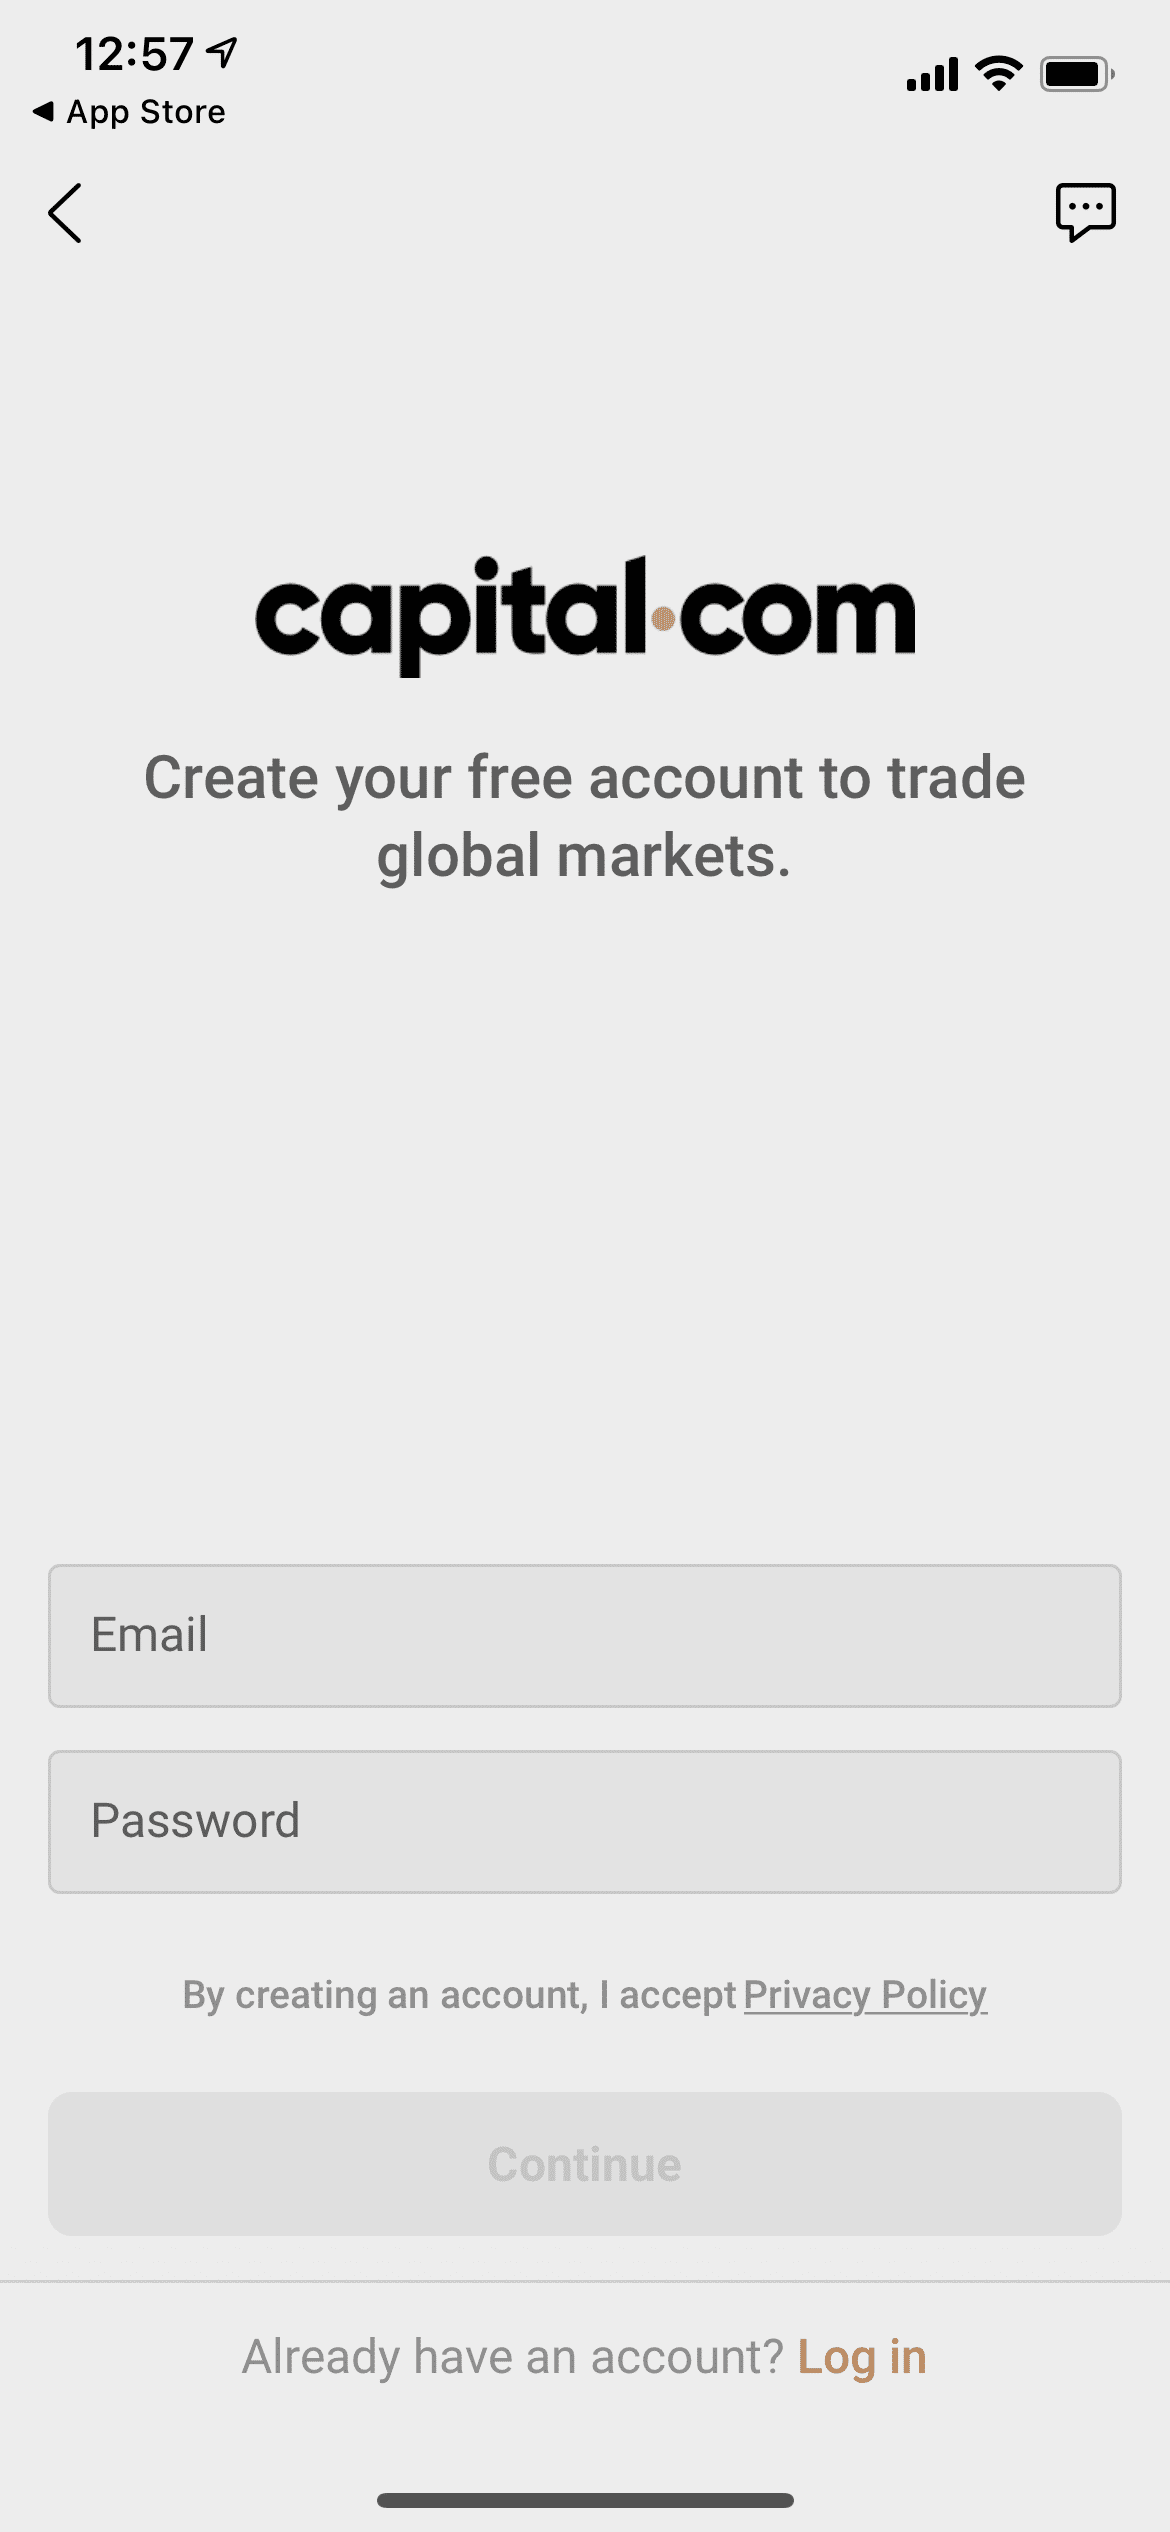 capital.com log in